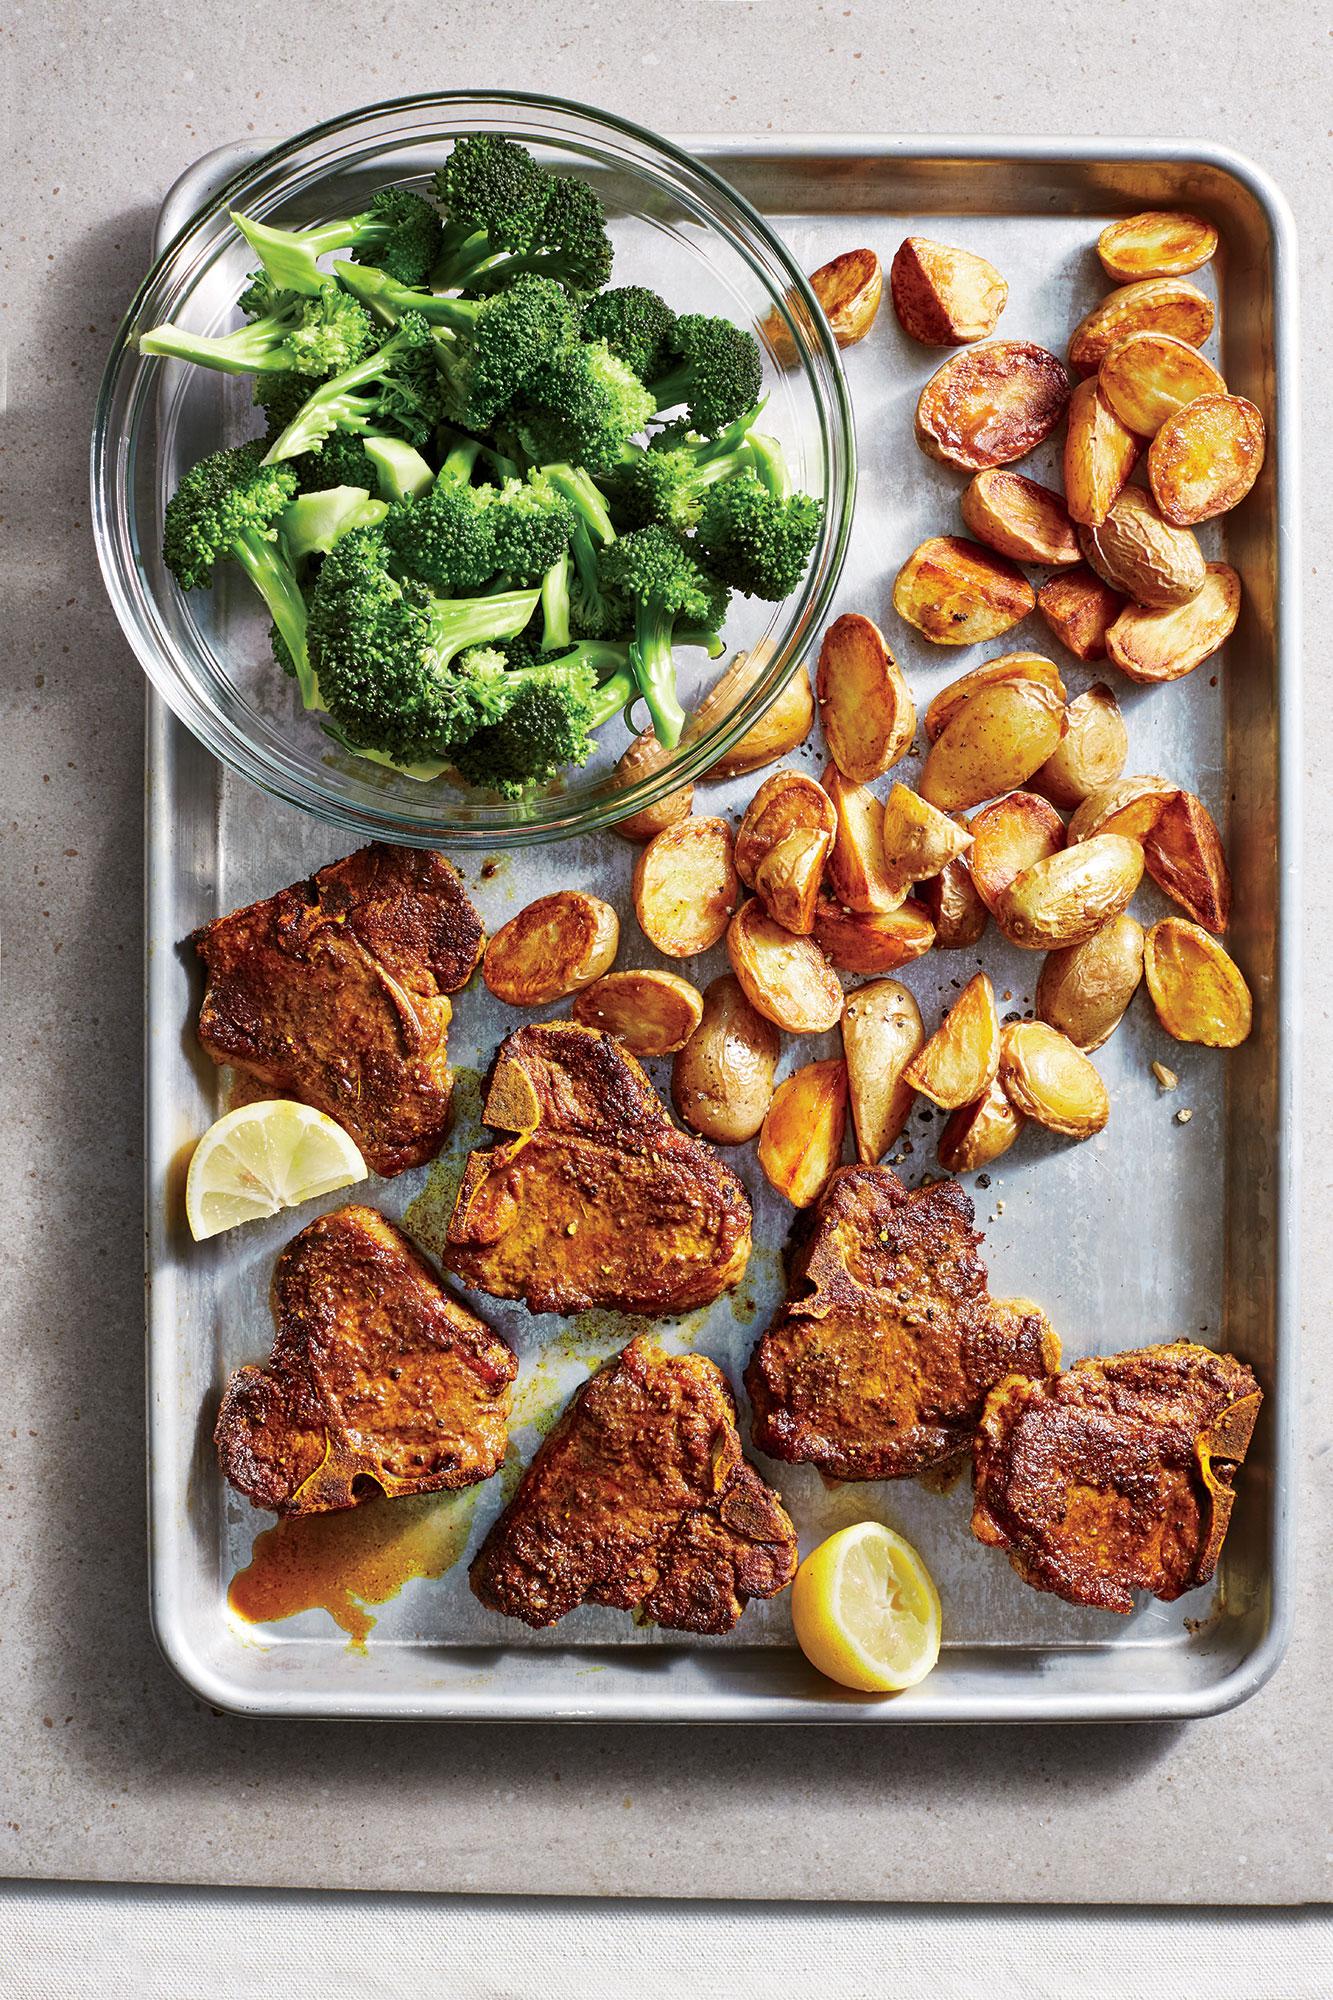 ck-Turmeric Lamb Chops with Crispy Potatoes and Broccoli